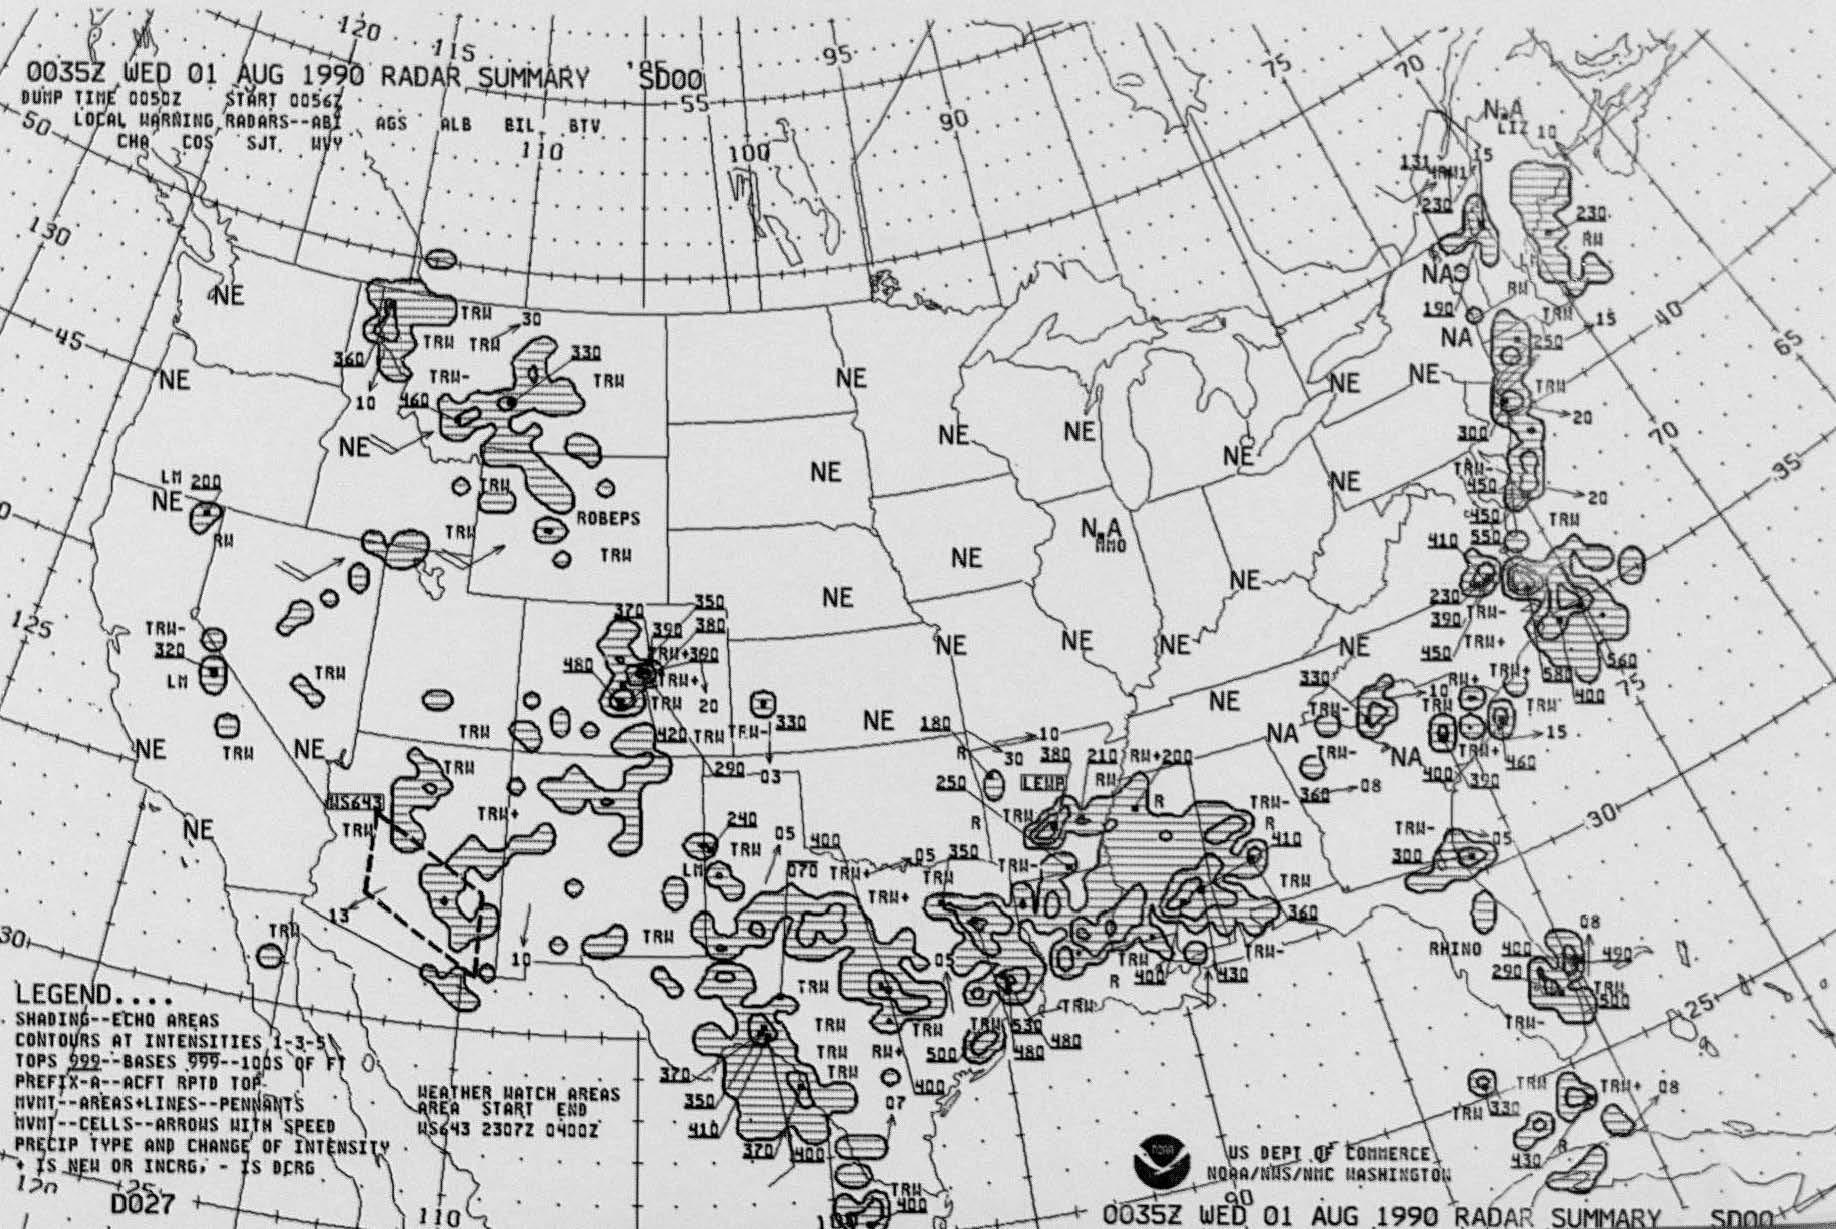 Sample image of Radar Summary Chart